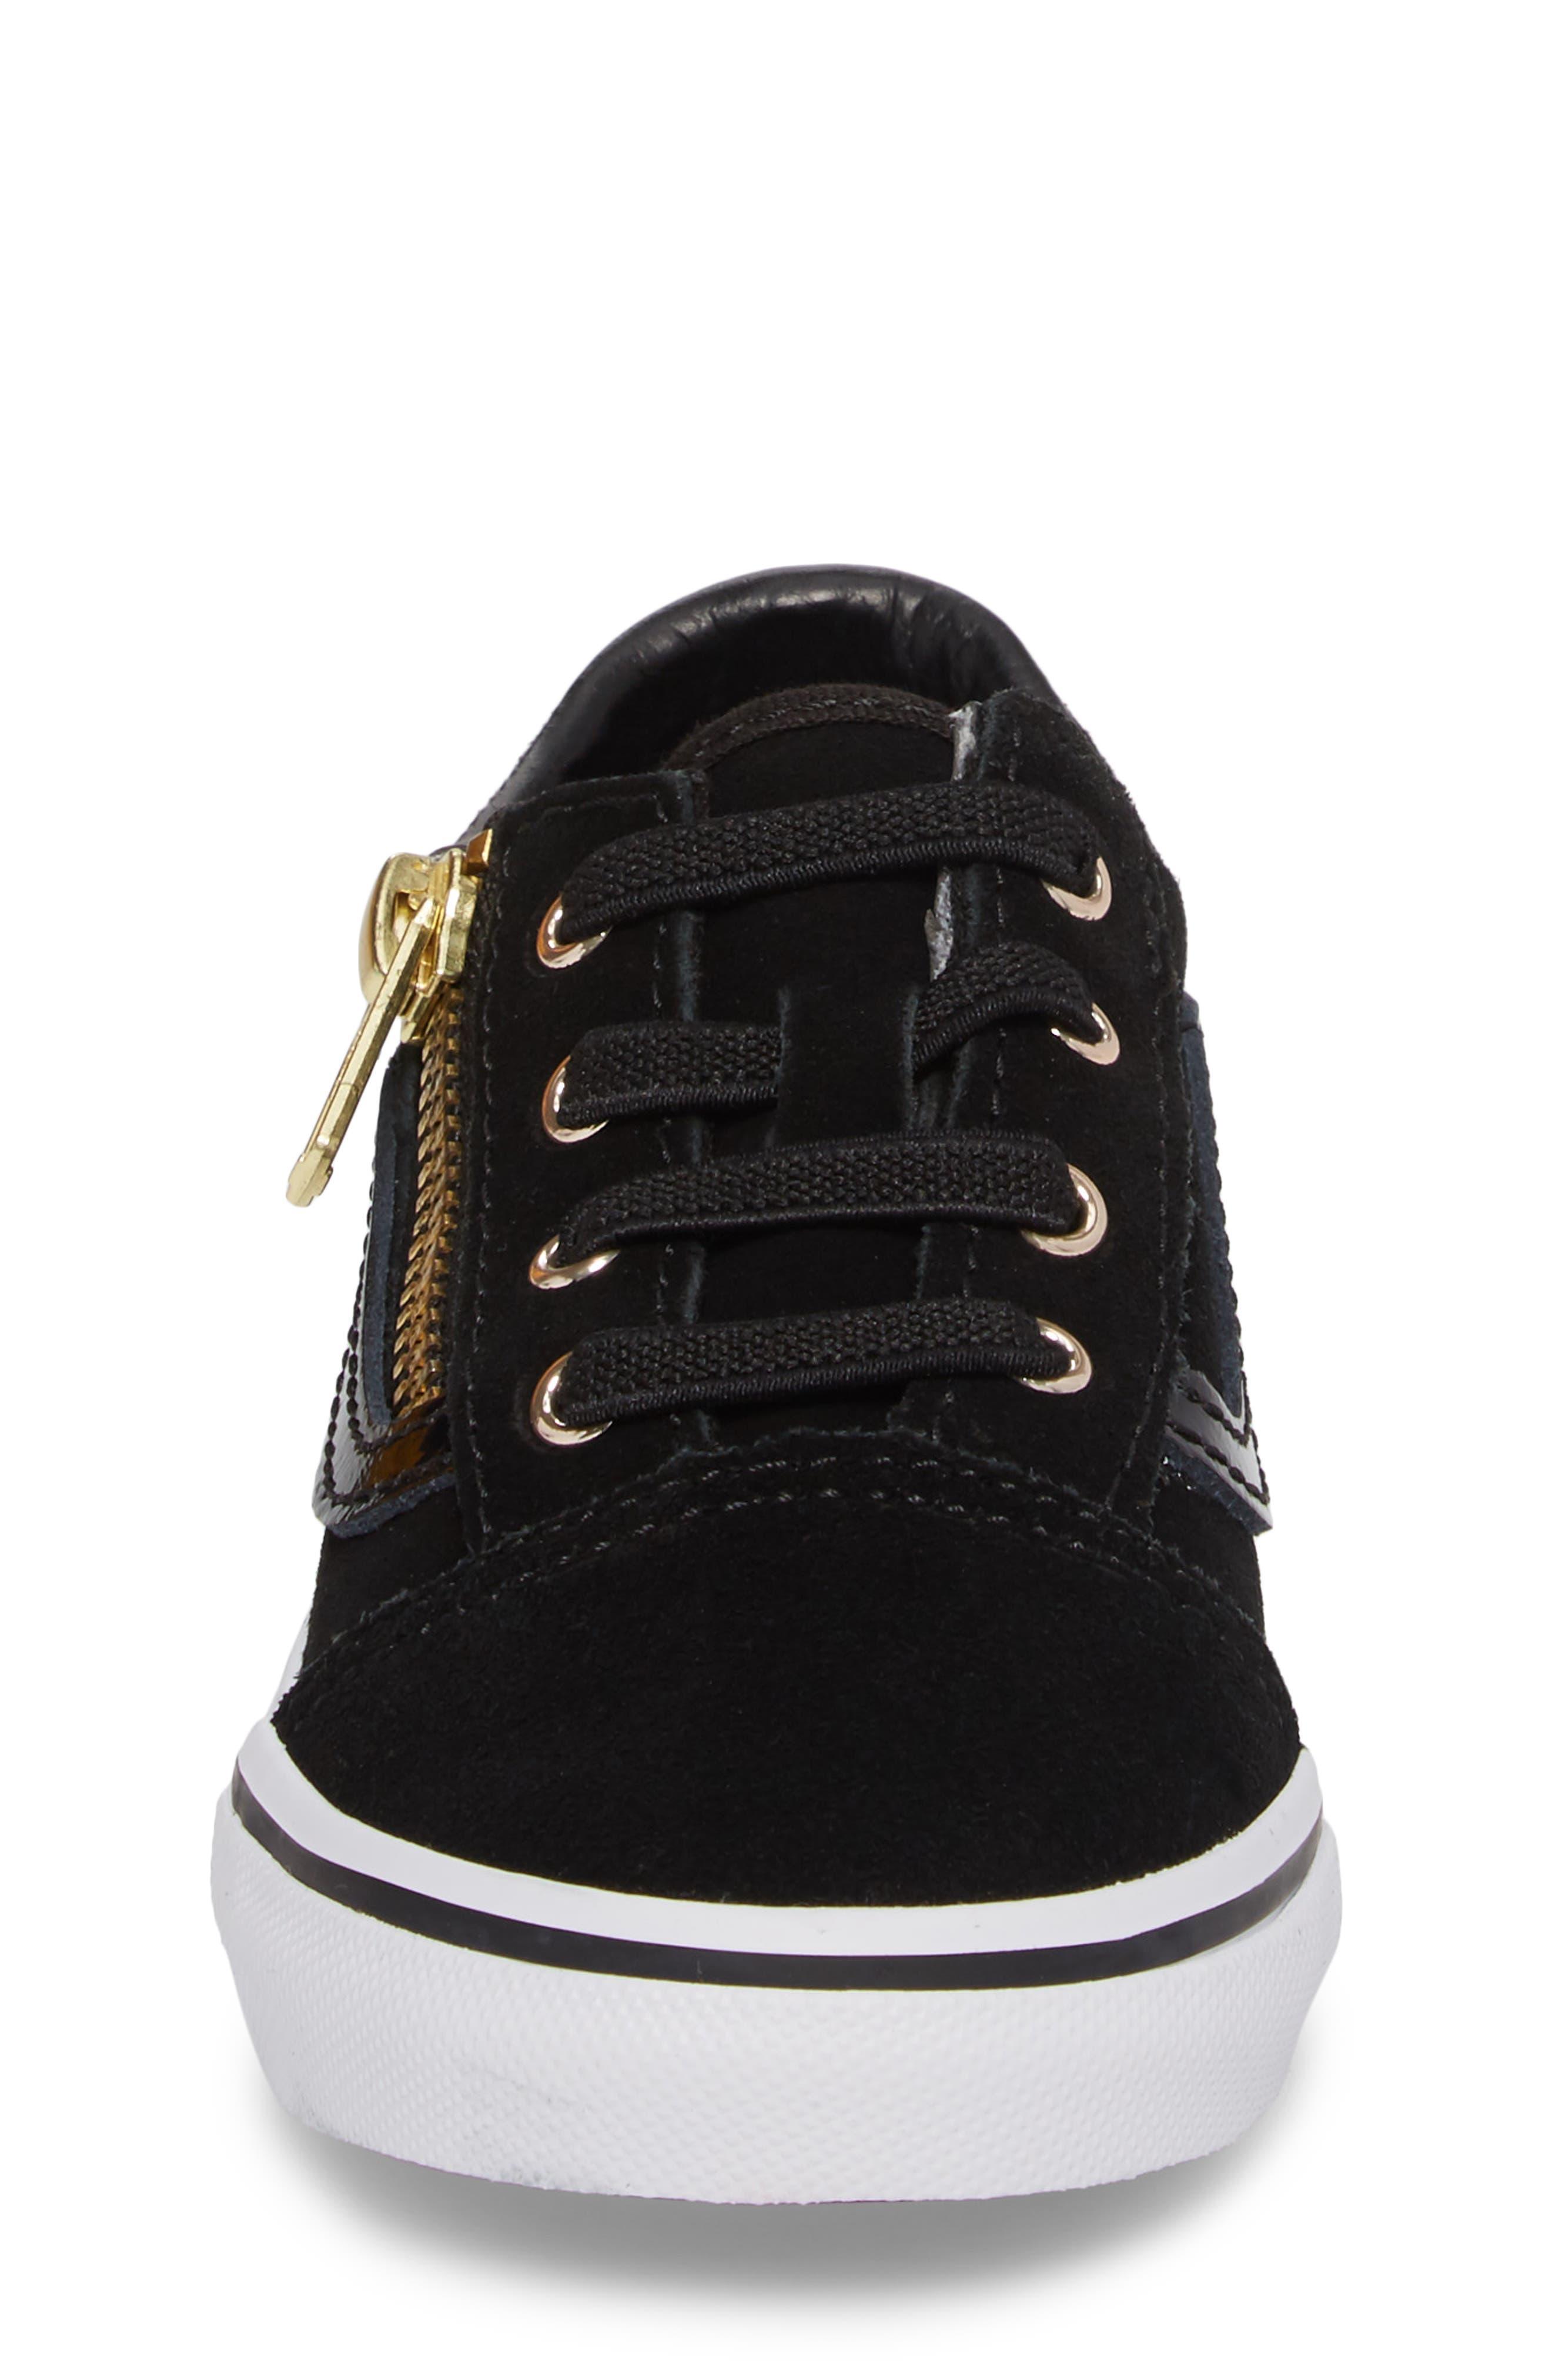 Old Skool Zip Sneaker,                             Alternate thumbnail 4, color,                             Black/ Gold